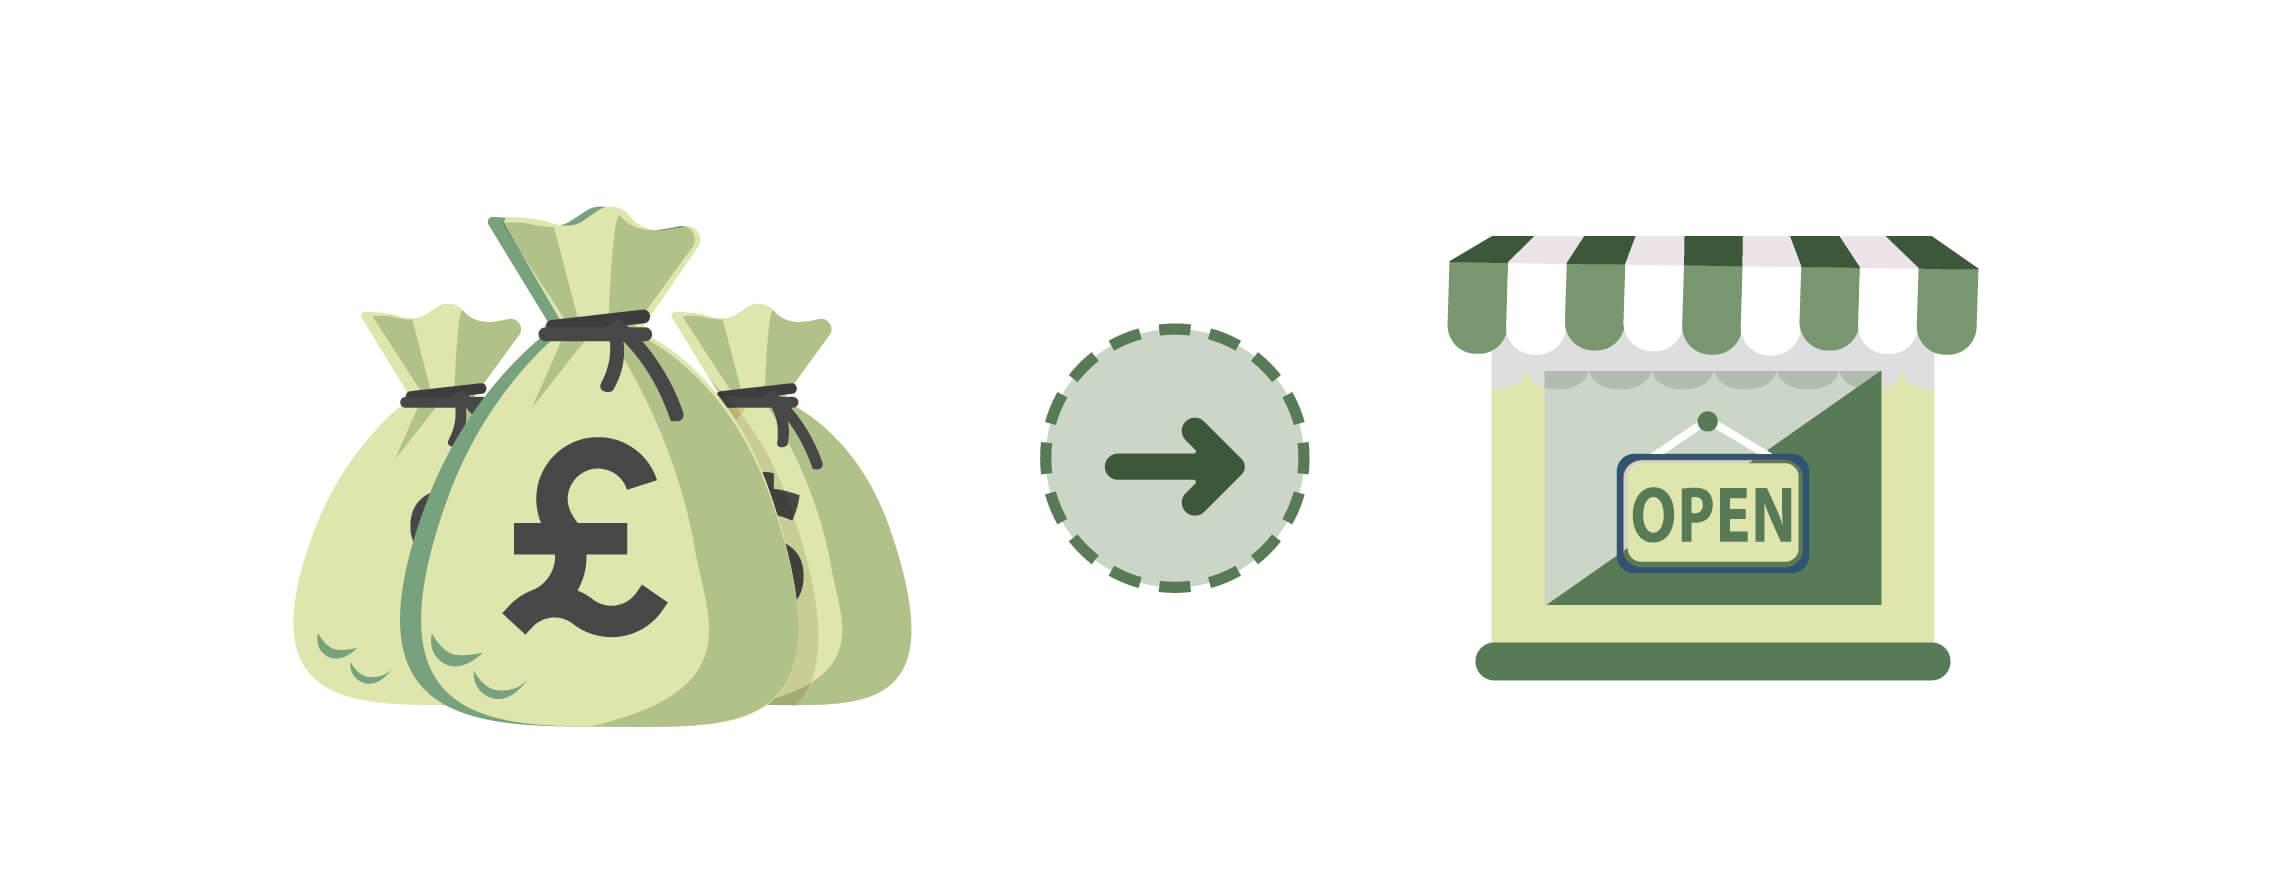 Cash grant illustration